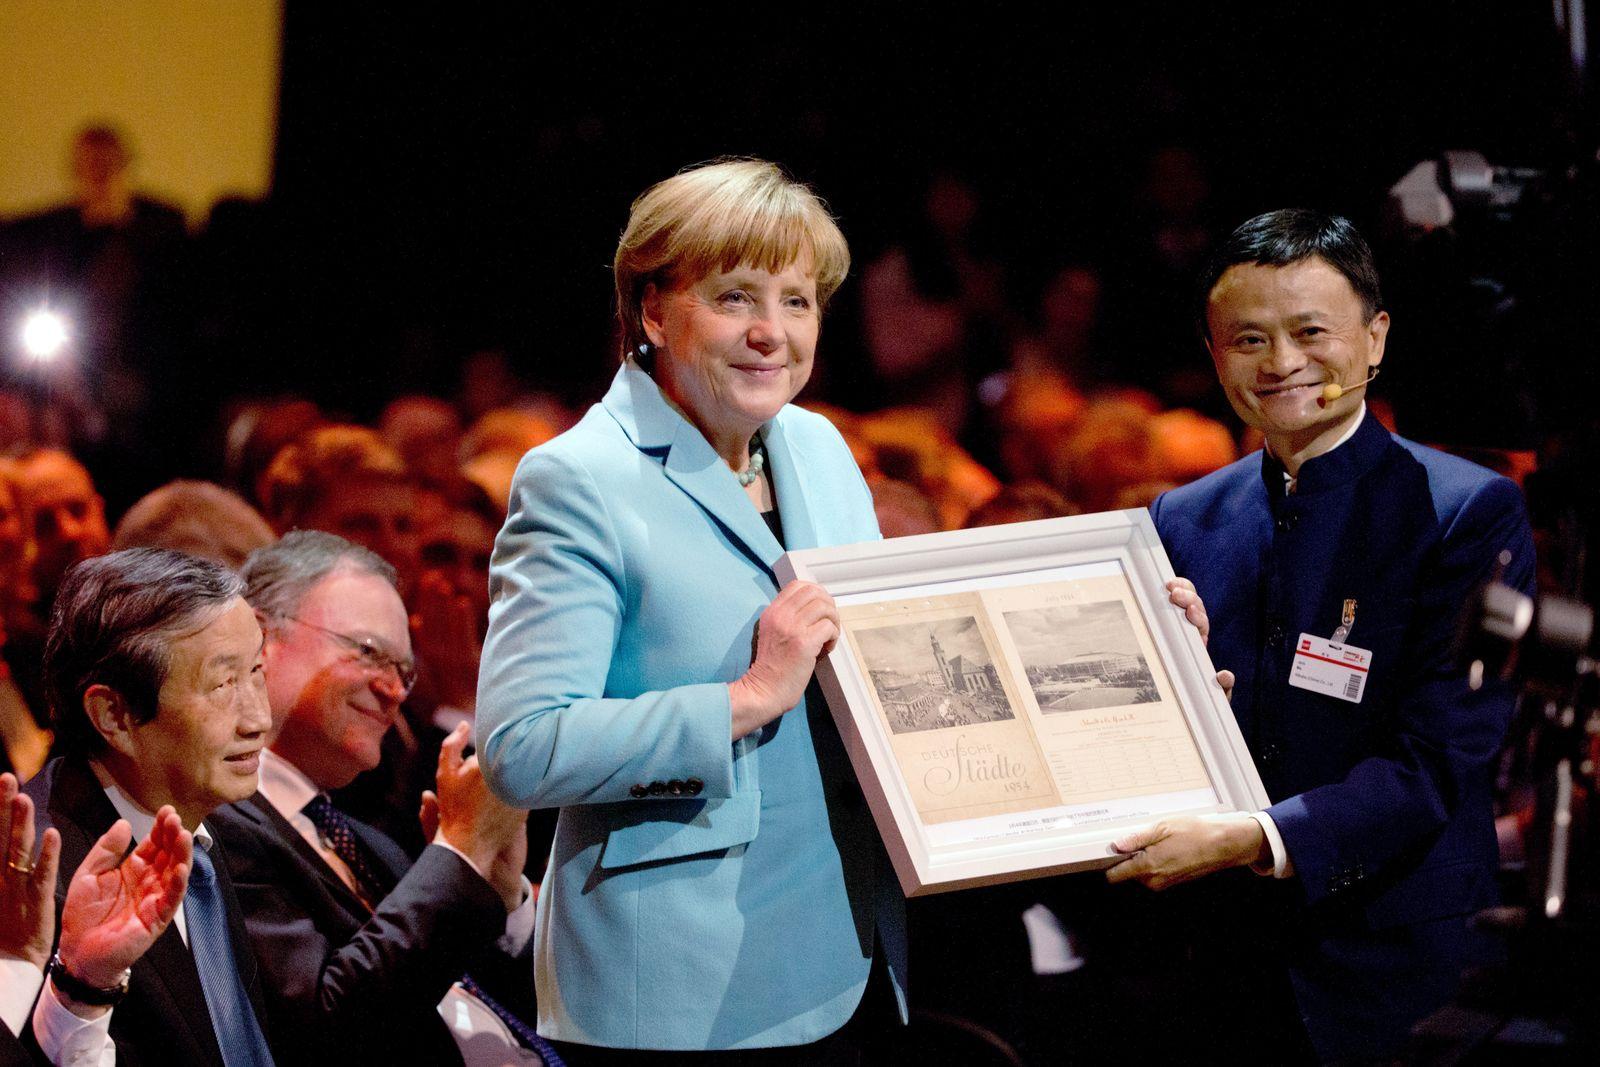 CeBIT 2015 / Merkel / Jack Ma